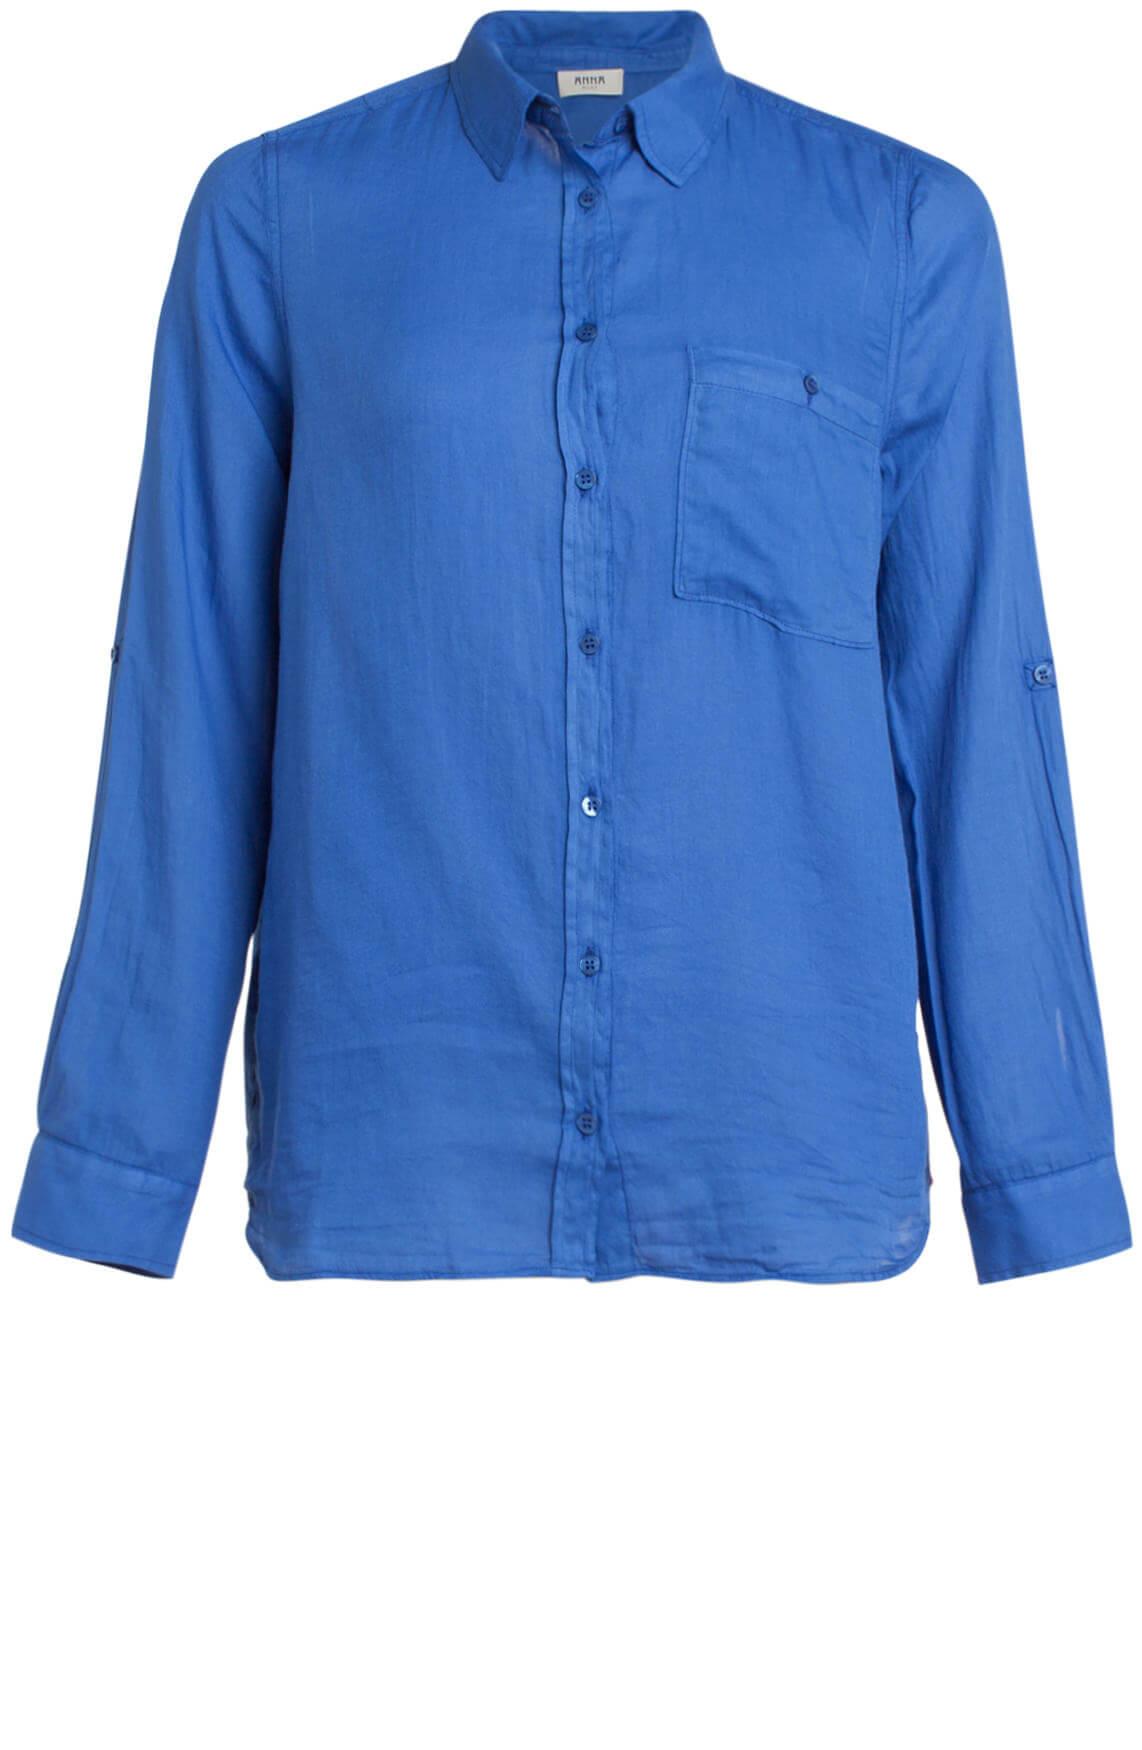 831617f14f6215 ... Anna Blue · Katoenen blouse blauw. Previous